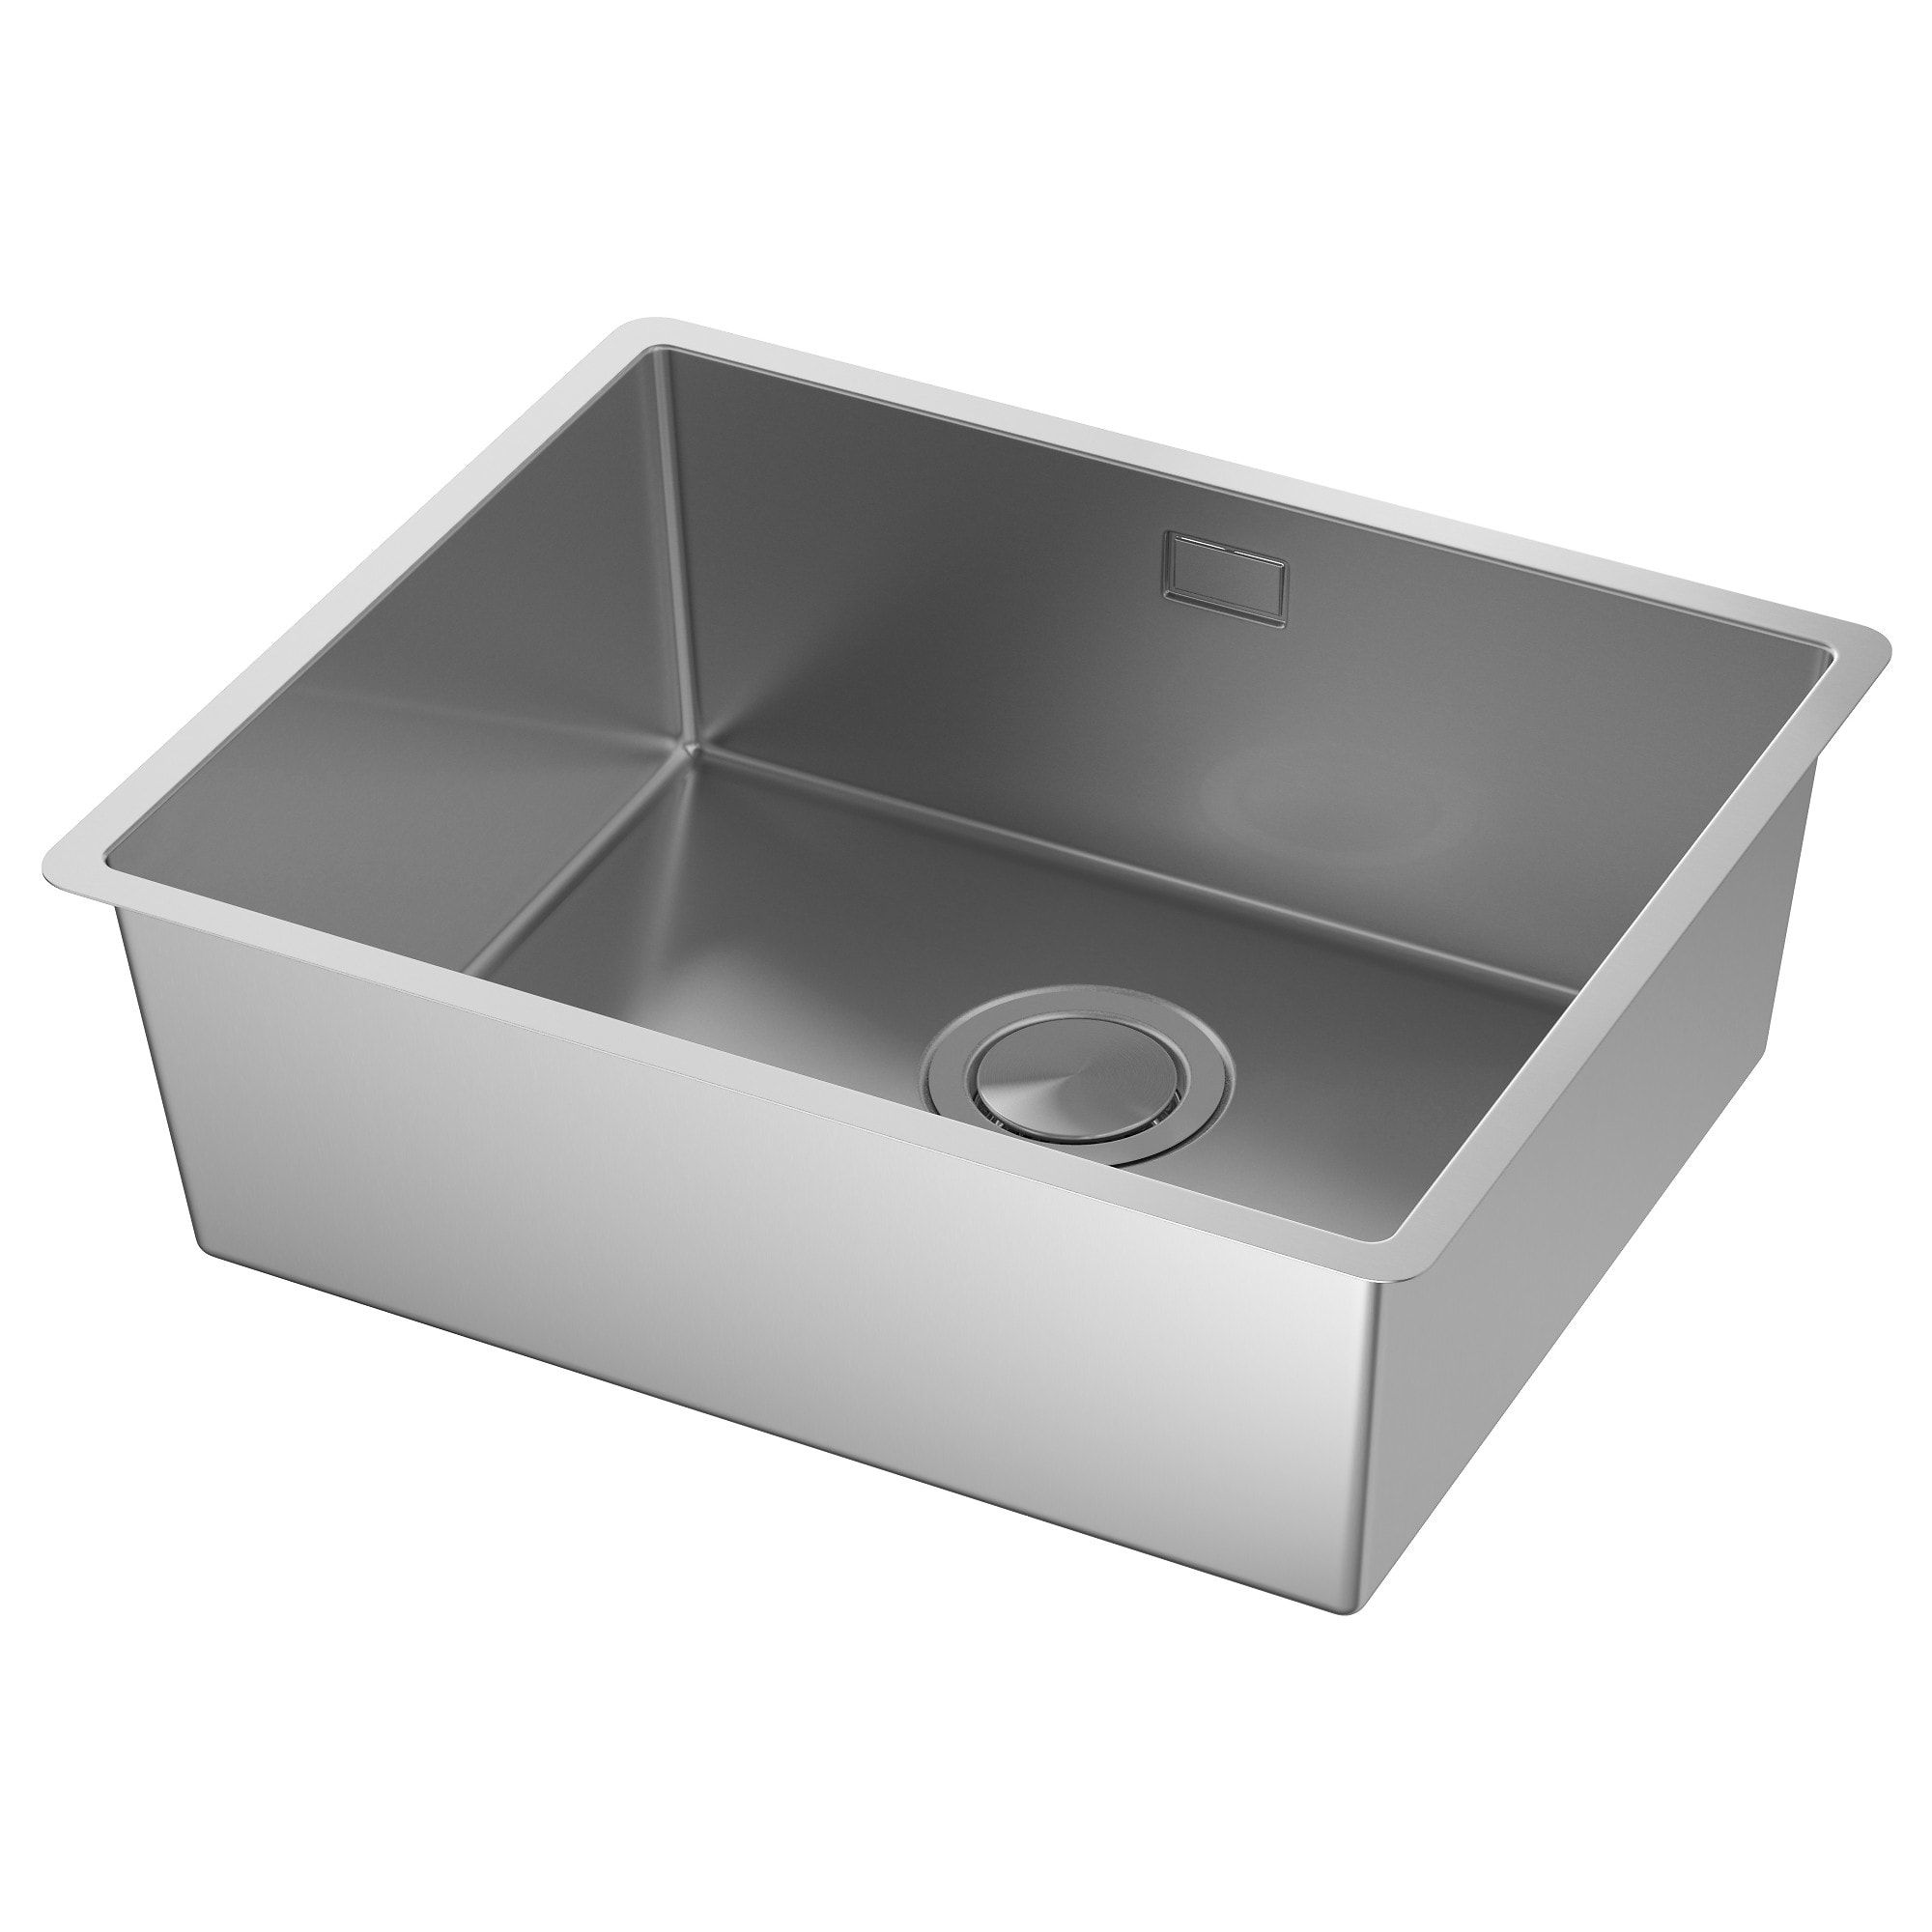 Norrsjon Evier Integre 1 Bac Acier Inoxydable 54x44 Cm Ikea Waschbecken Einbauspule Metod Unterschrank